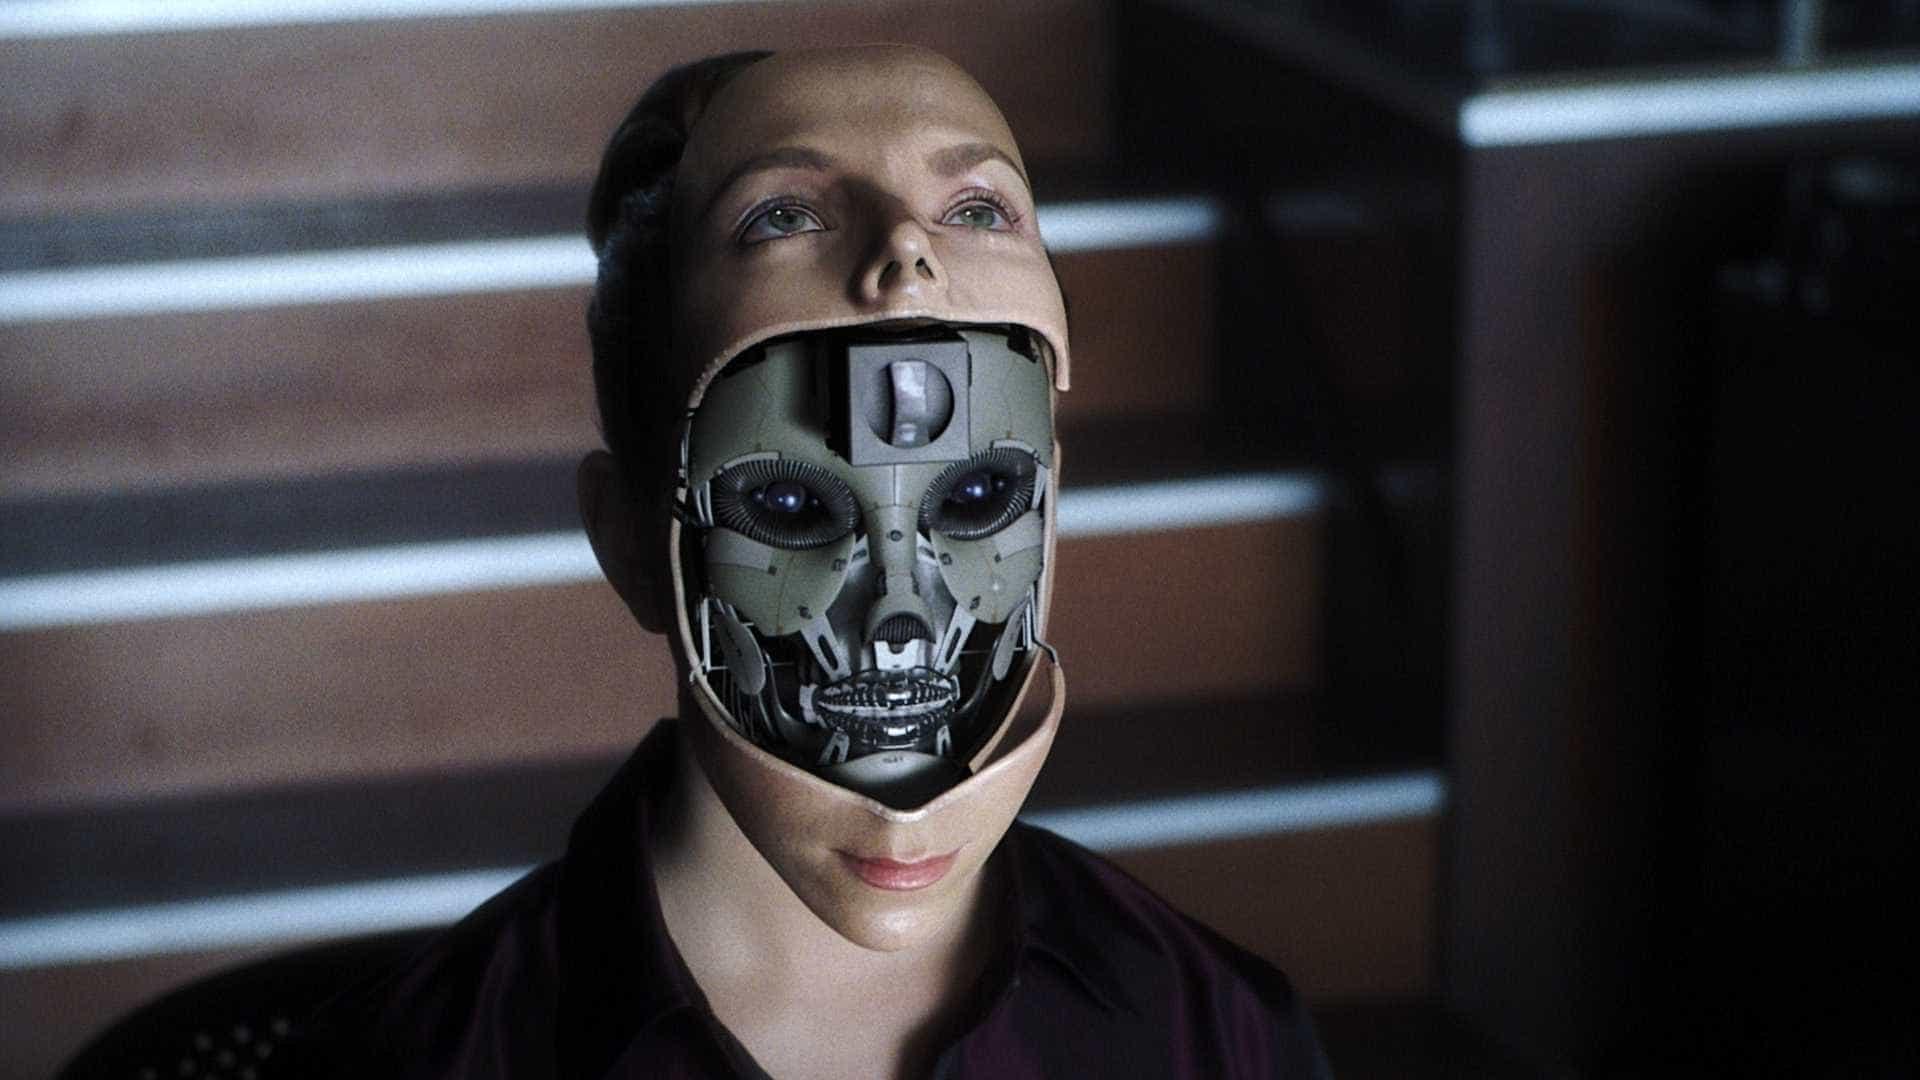 'Humanidade enfrentará ameaça',  diz Elon Musk sobre robôs